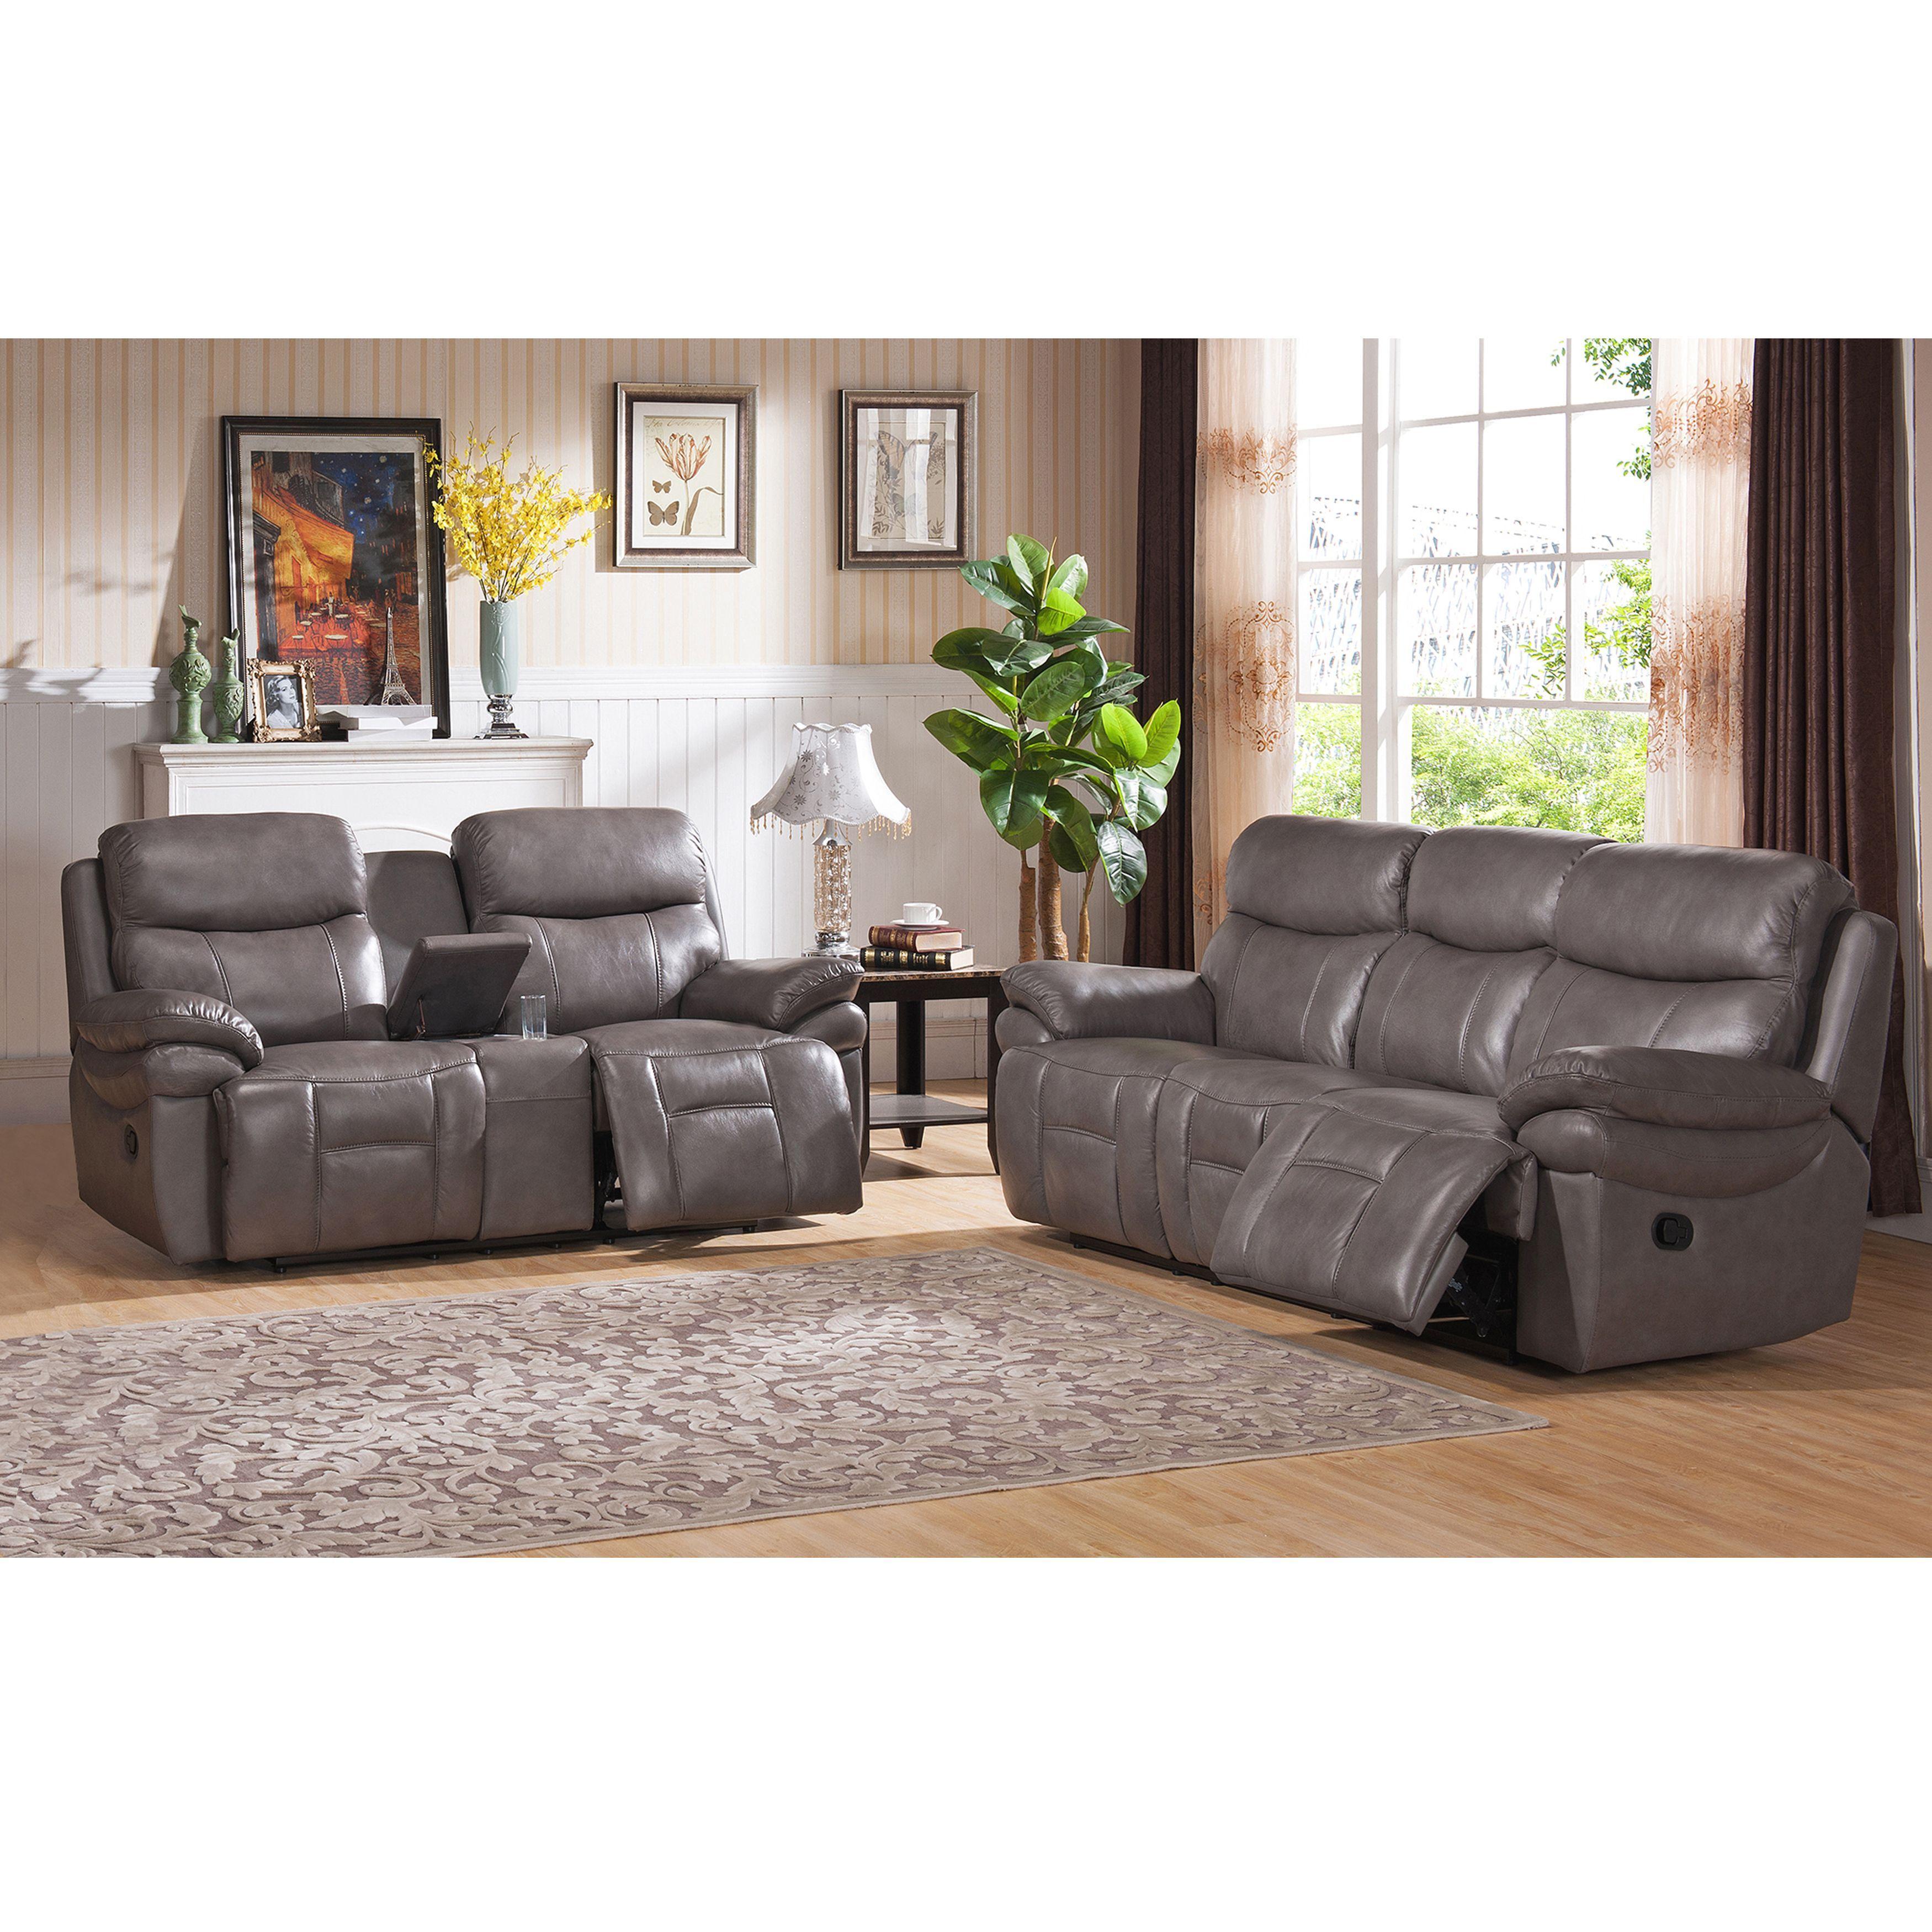 Argo Grey Premium Top Grain Leather Lay Flat Reclining Sofa And Loveseat  (Foam)